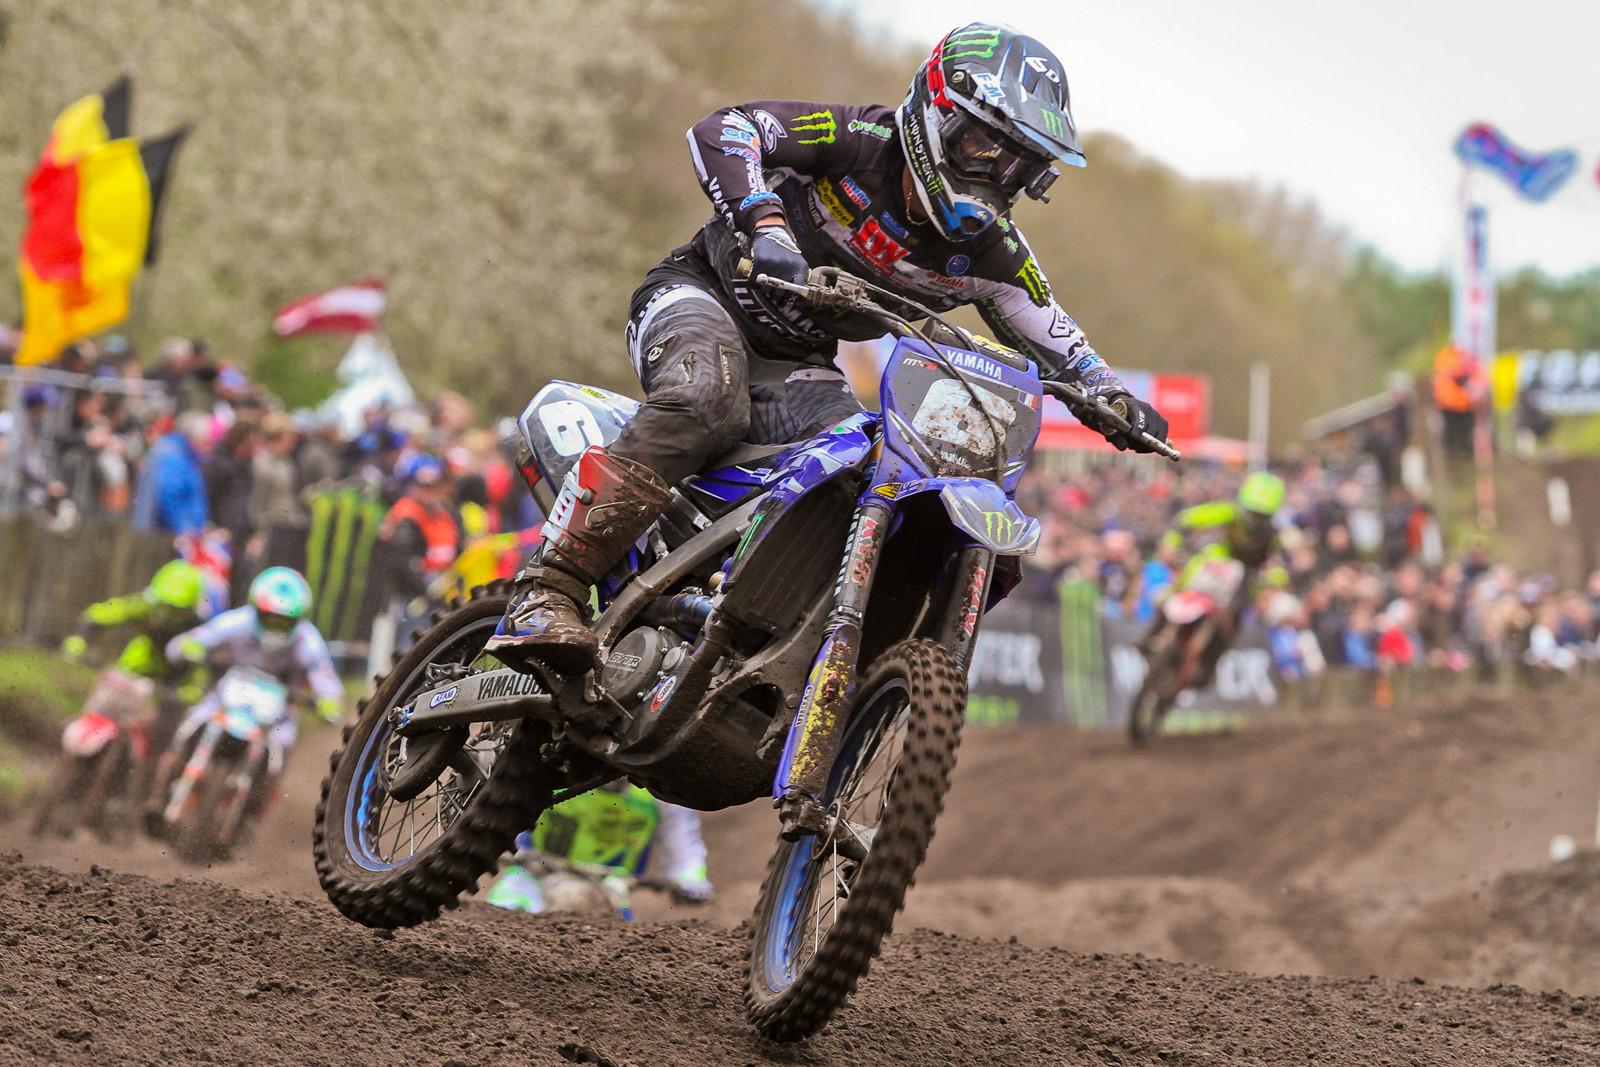 Benoit Paturel - Photo Blast: 2017 MXGP of Valkenswaard - Motocross Pictures - Vital MX